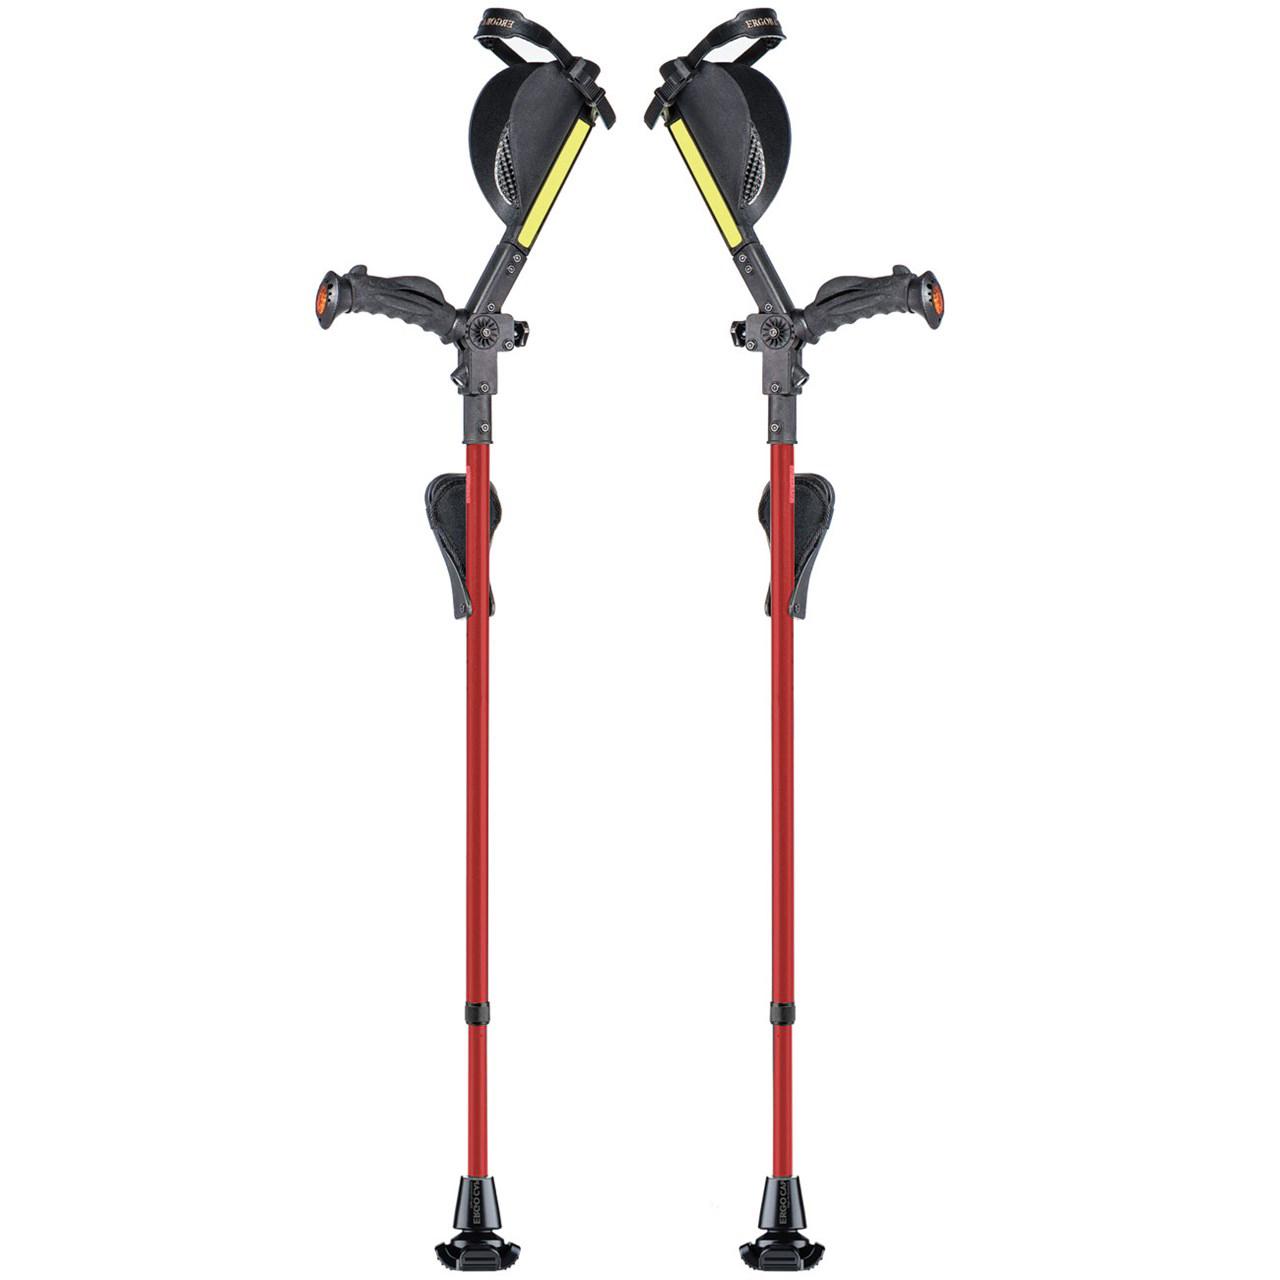 Ergobaum Ergonomic Forearm Crutches - Adult - Pink